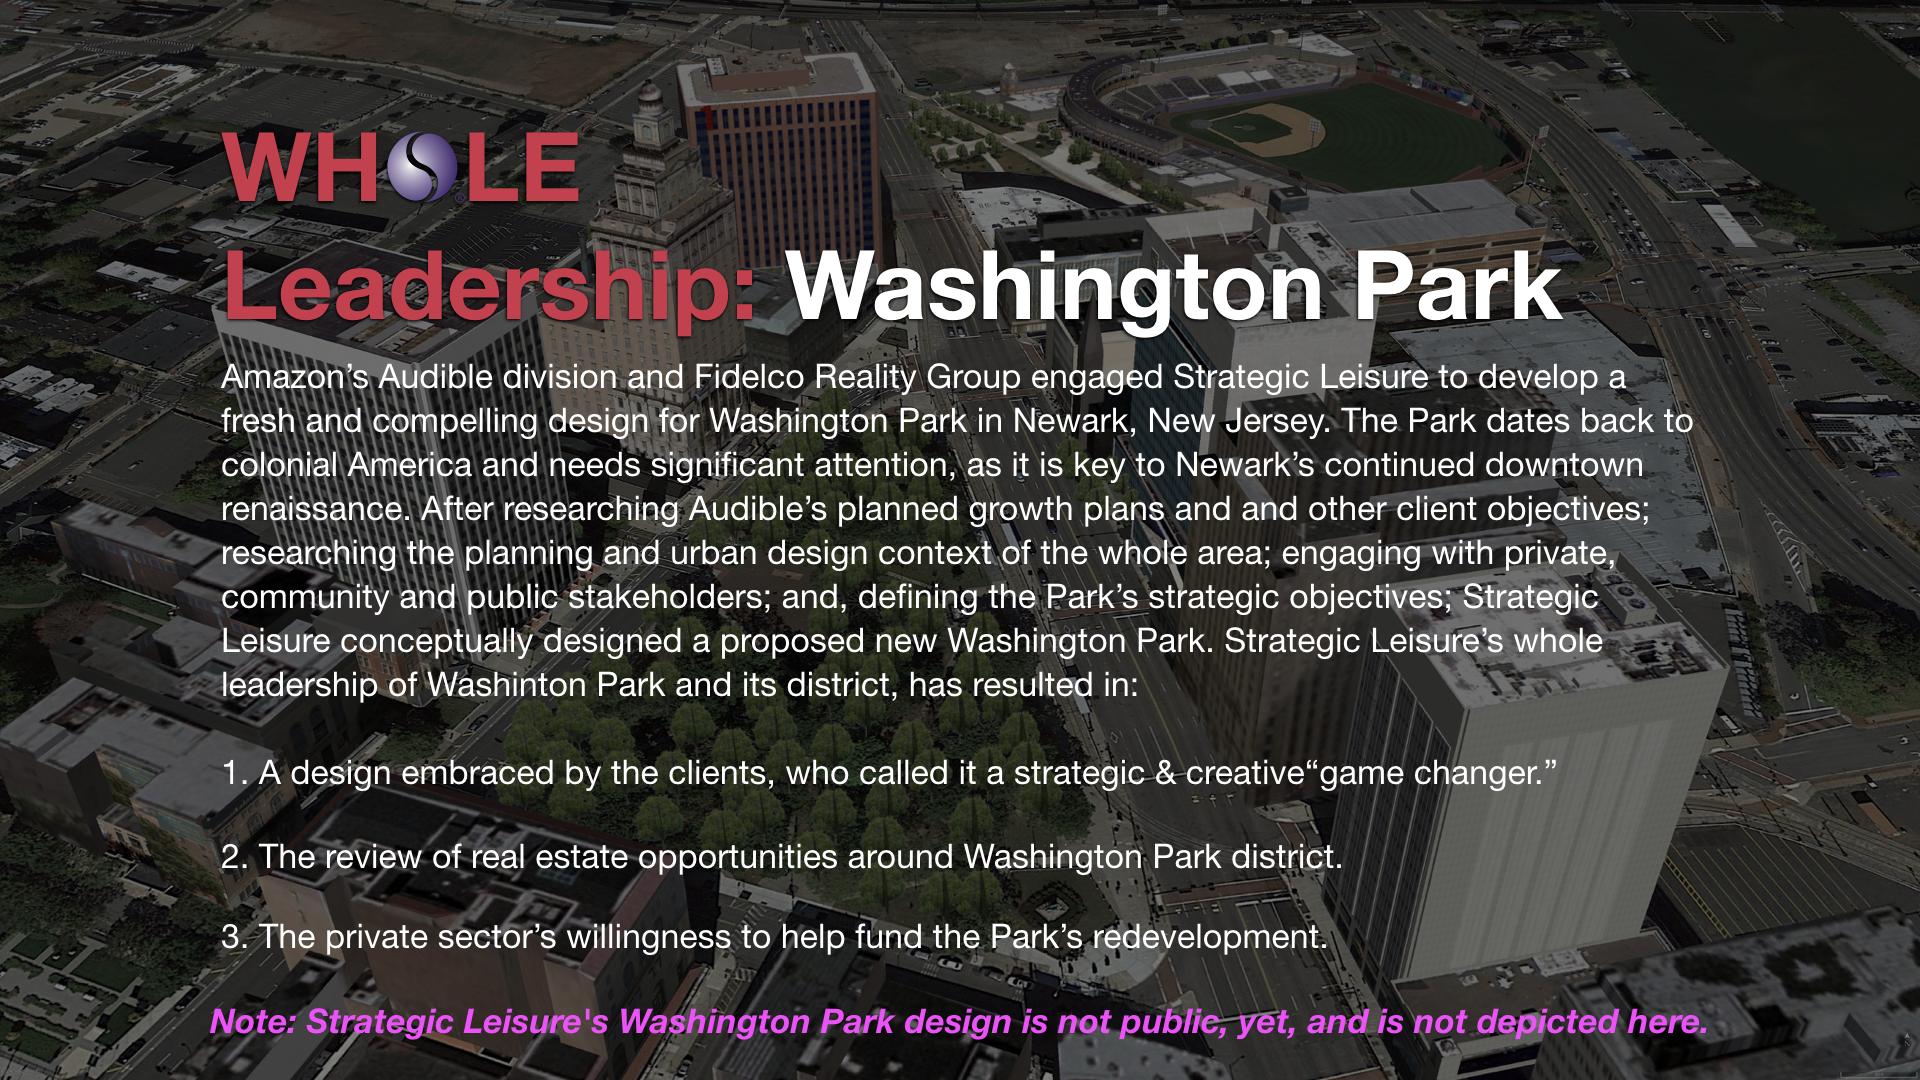 Washington Park Whole Leadership.001.png